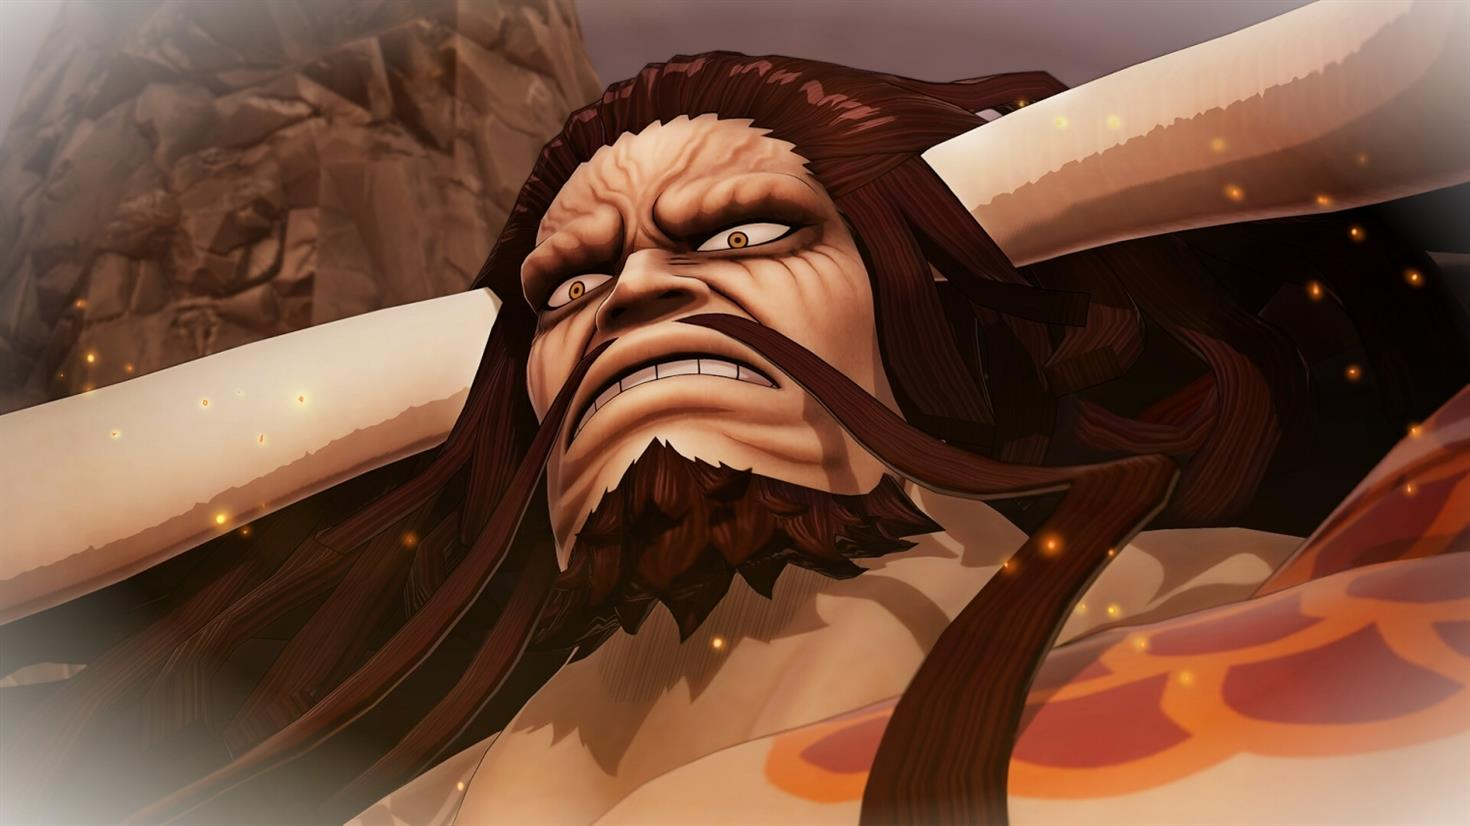 One Piece Capitolo 1016 Data di uscita Spoiler Kaido avverte diTtSofsw 1